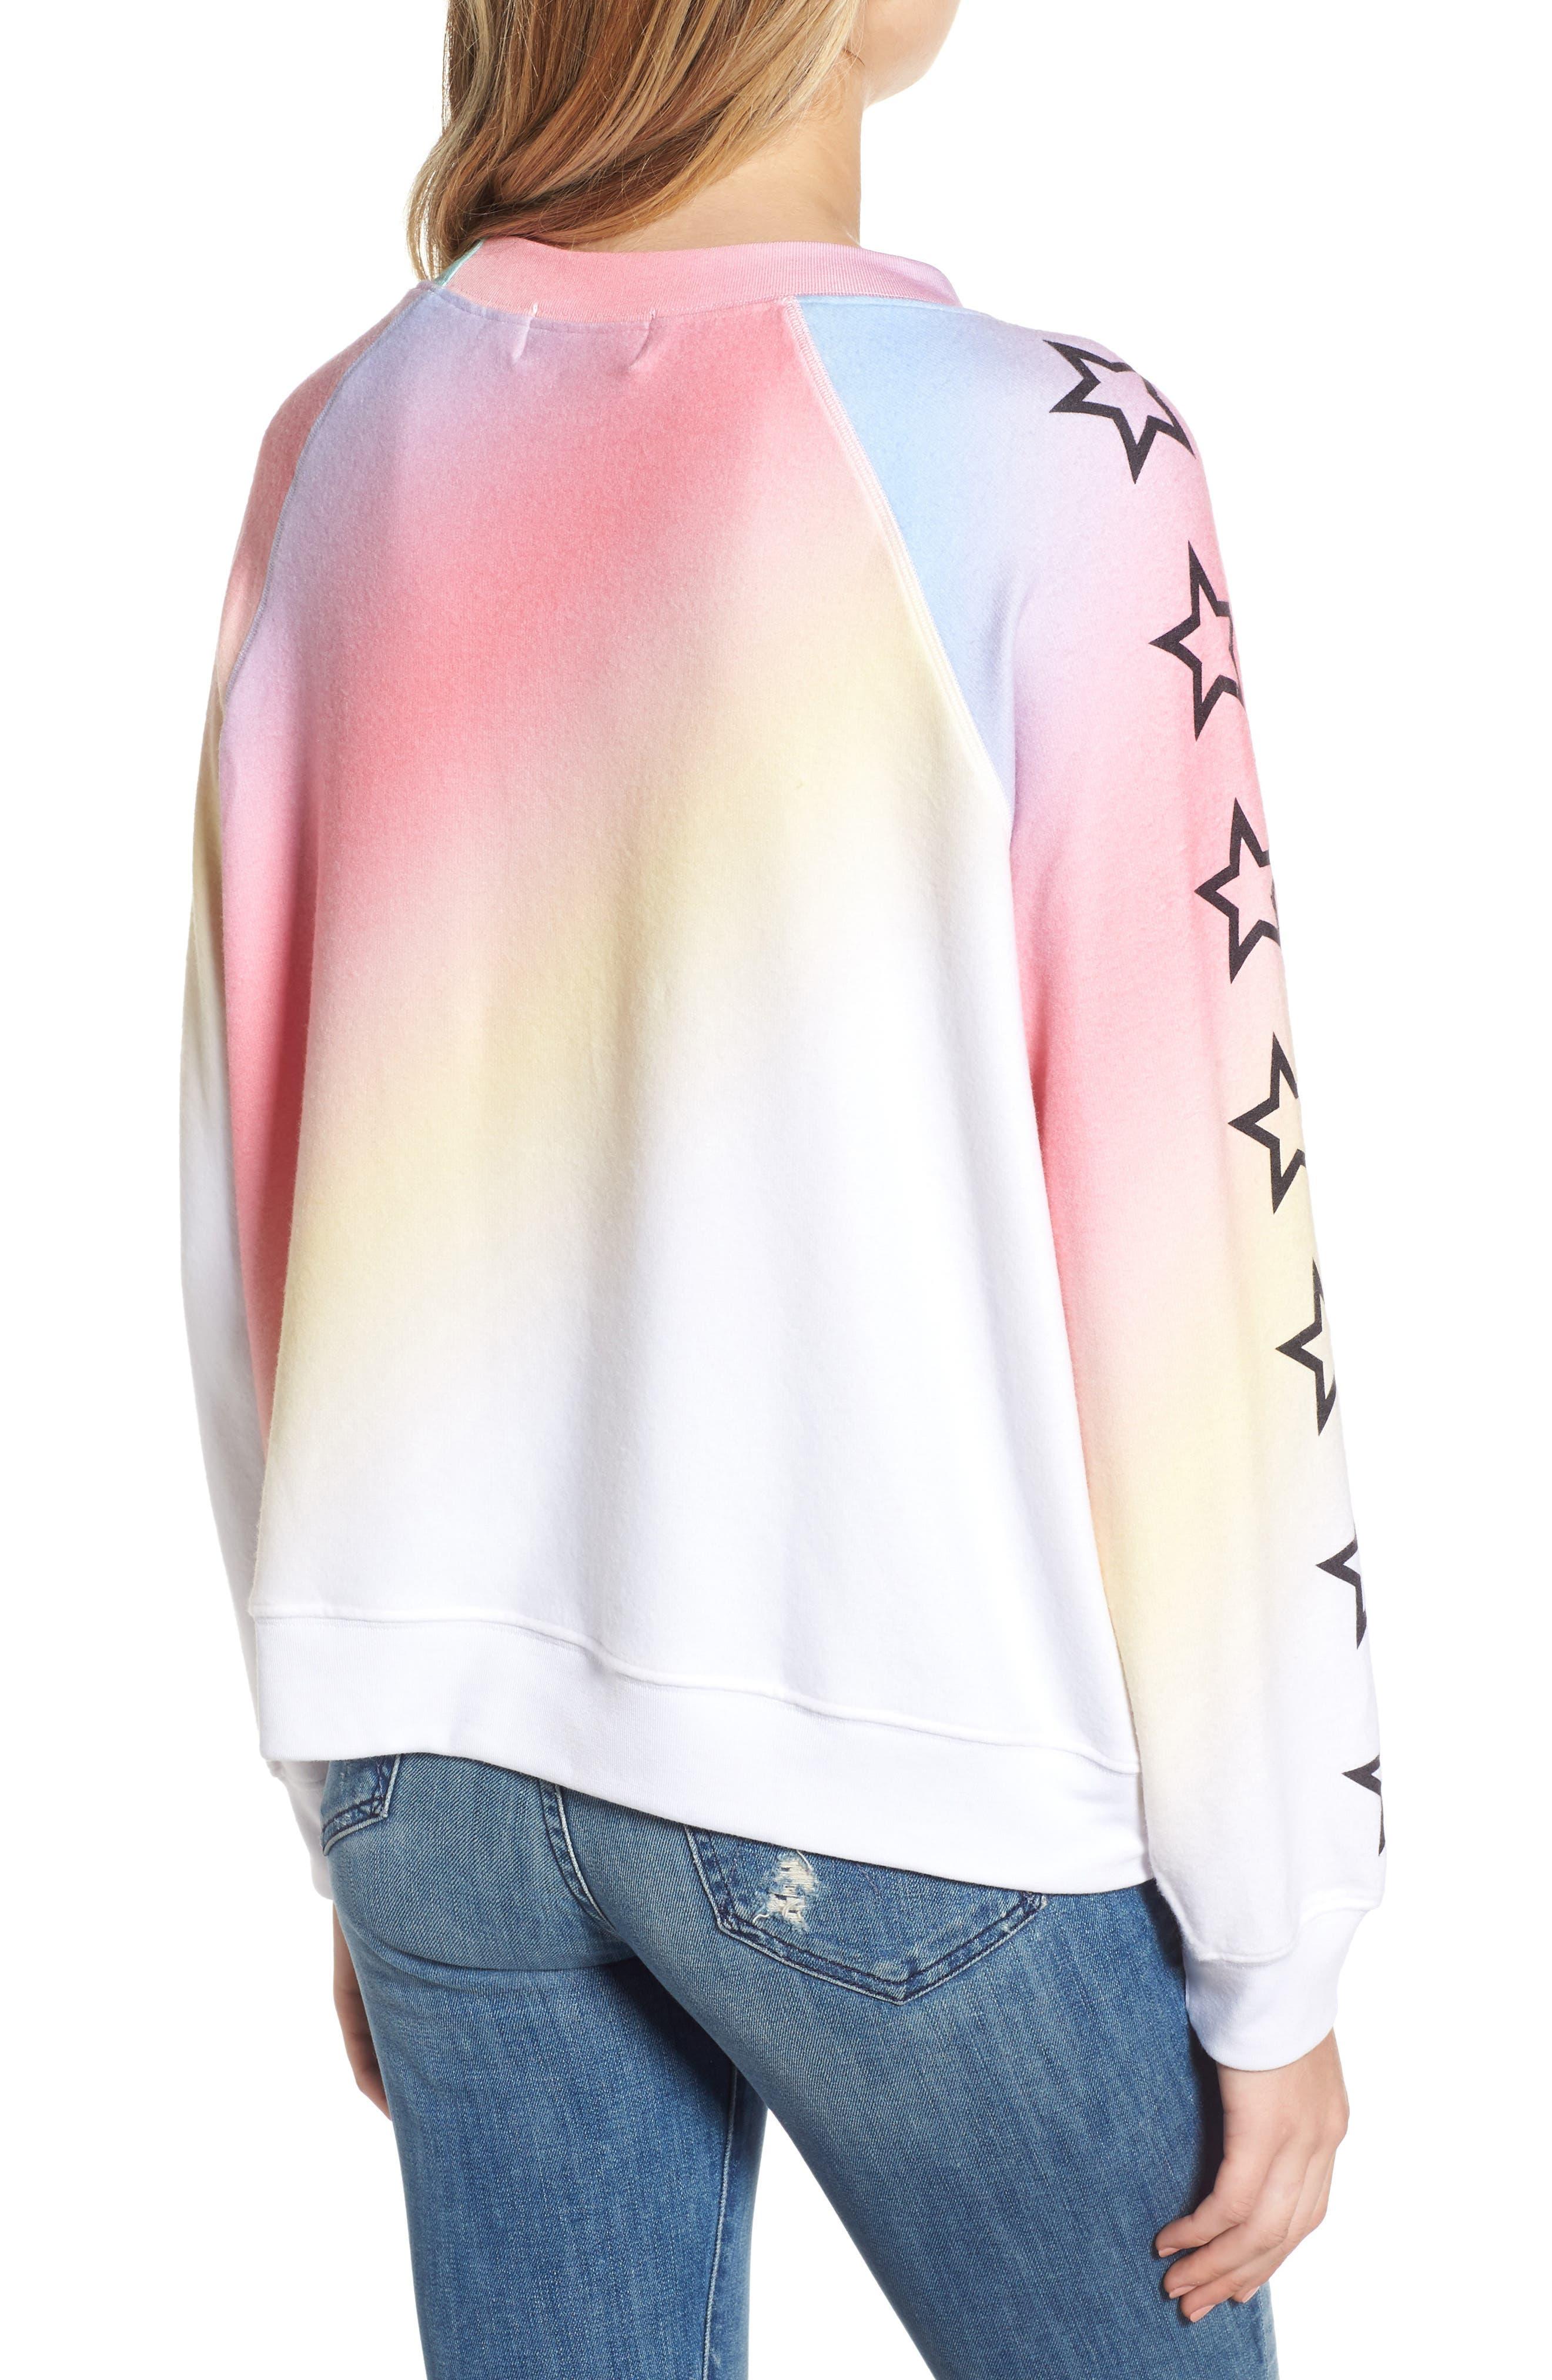 Sommers - Nebula Sweatshirt,                             Alternate thumbnail 2, color,                             650